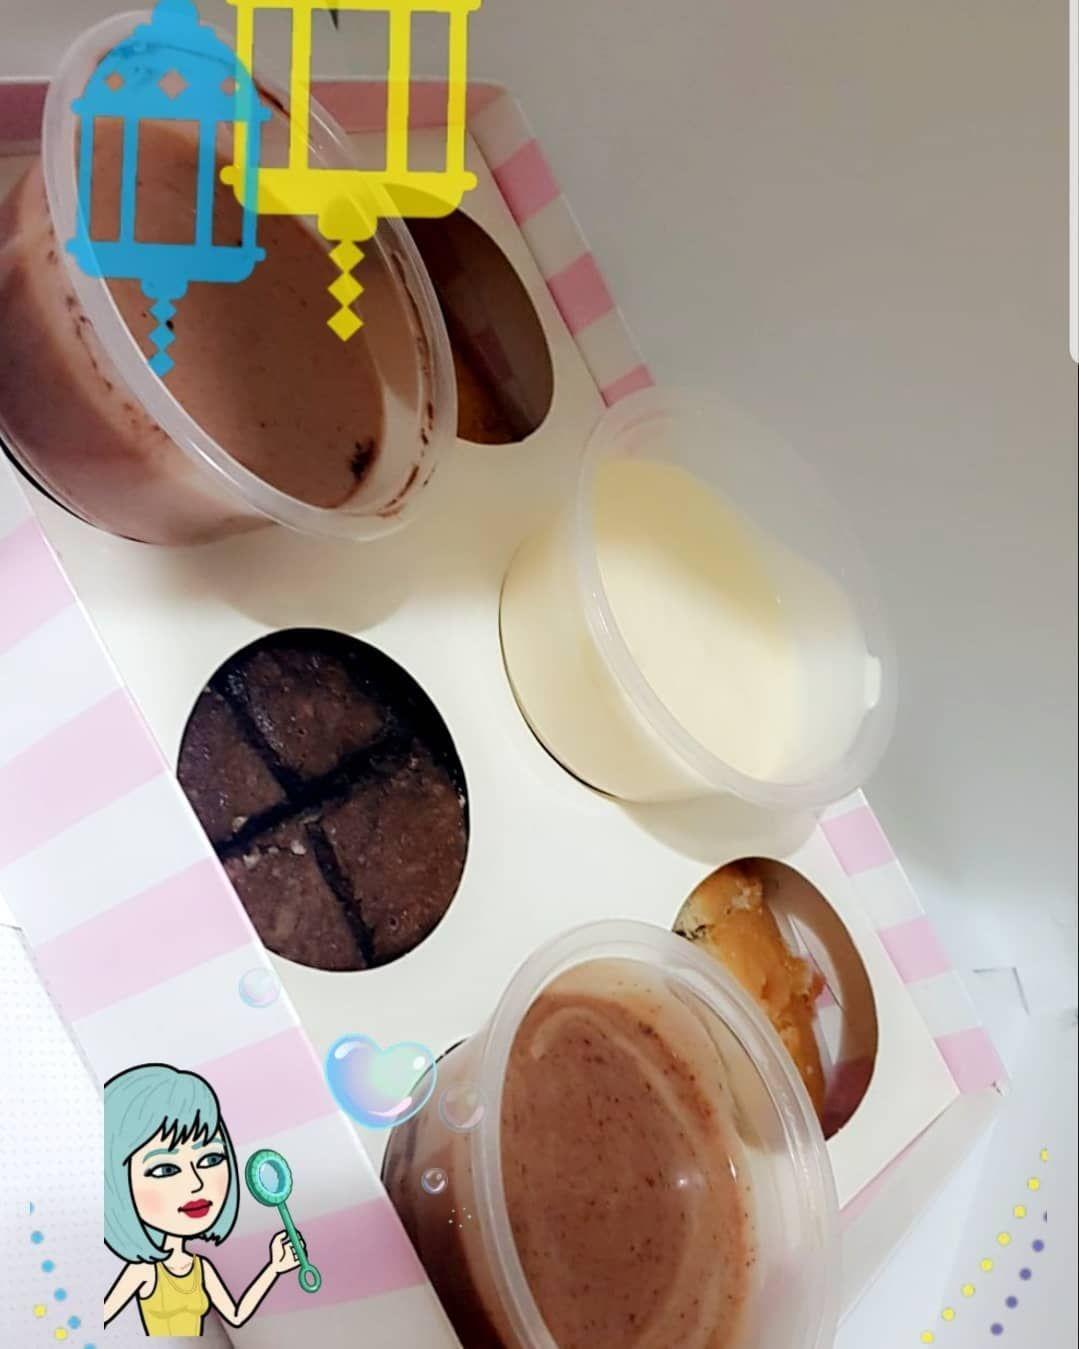 Kuwait Ku Cake Sweet Babati Babati Cup كيك حلويات نوتيلا لوتس كندر سويت قهوه كويت كويتيات توصيل عرض Instagram Posts Instagram